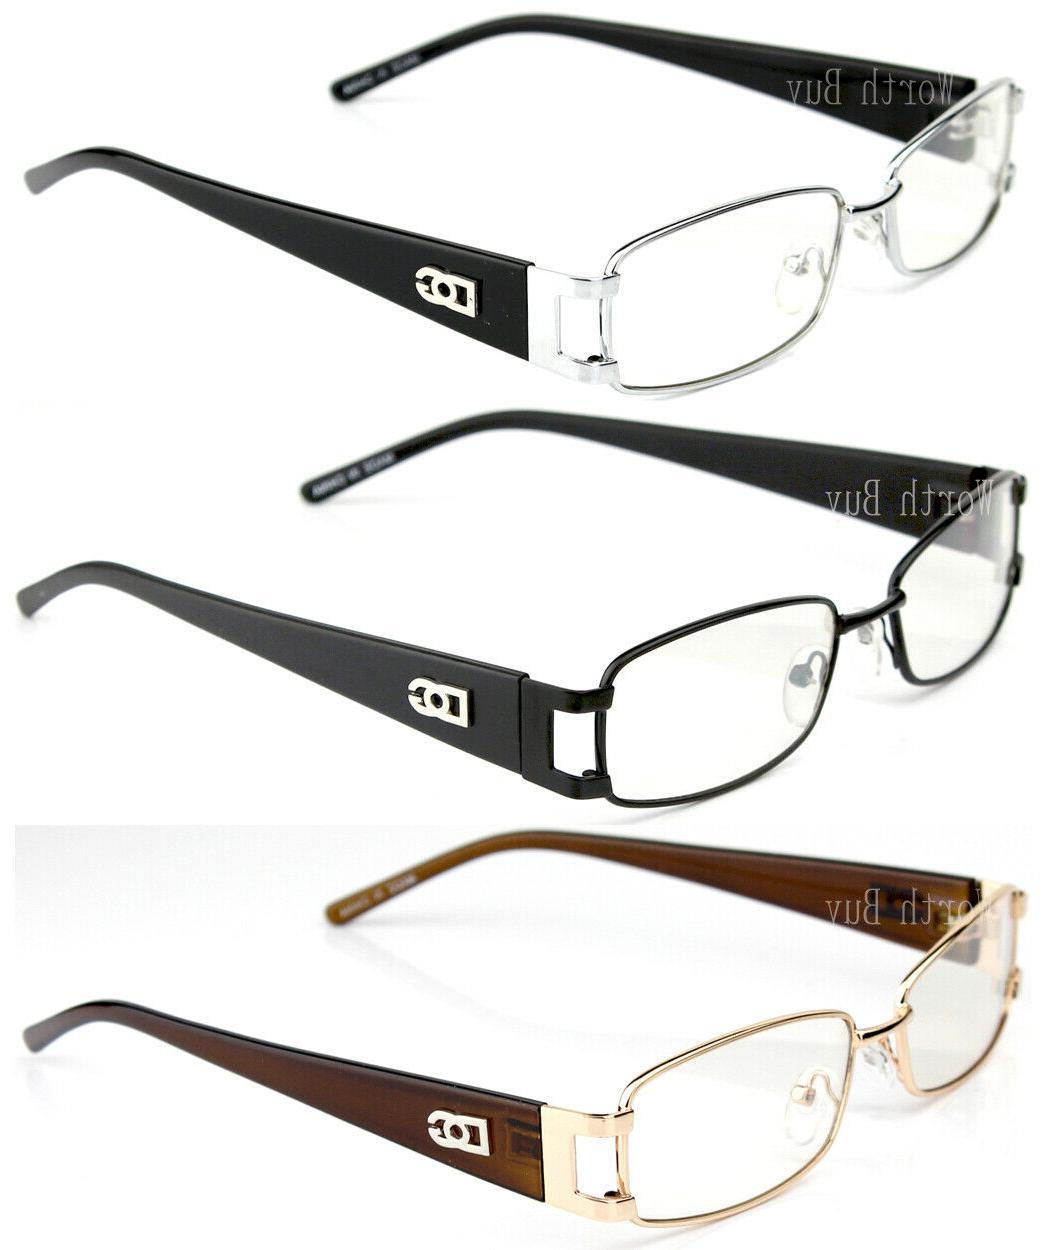 new rectangular fashion clear lens frame eye